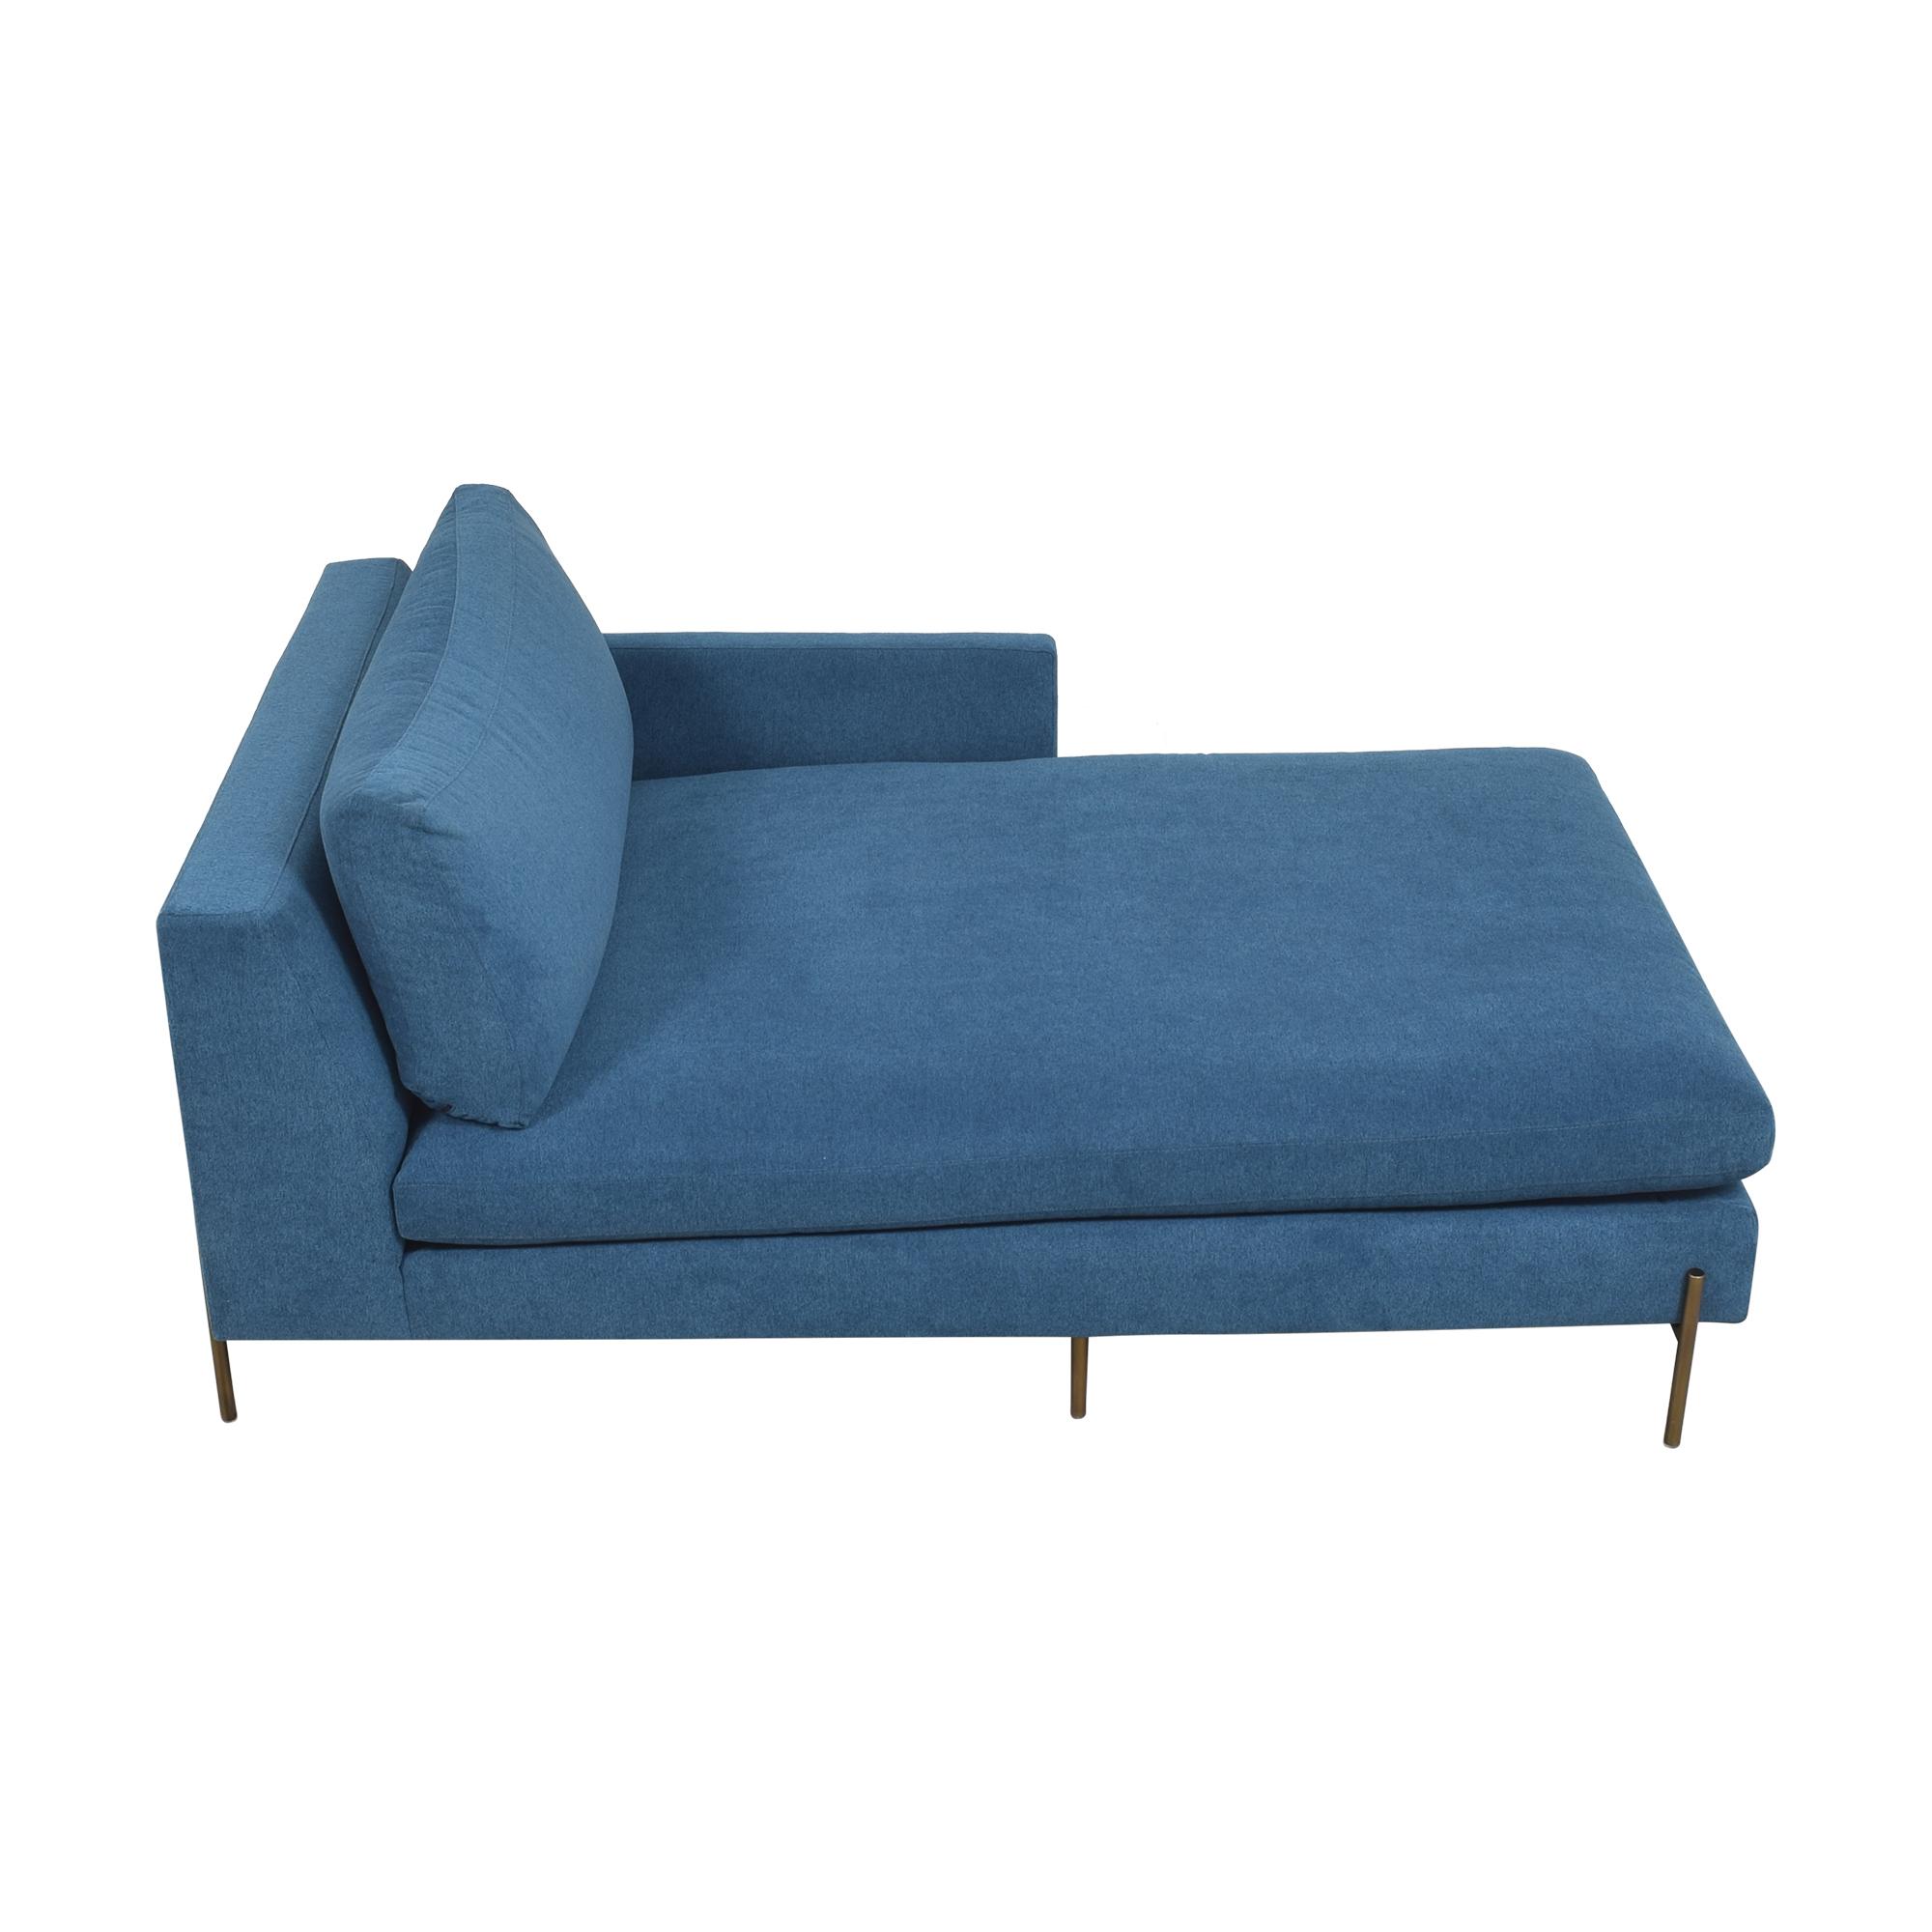 BenchMade Modern BenchMade Modern Catwalk Chaise blue